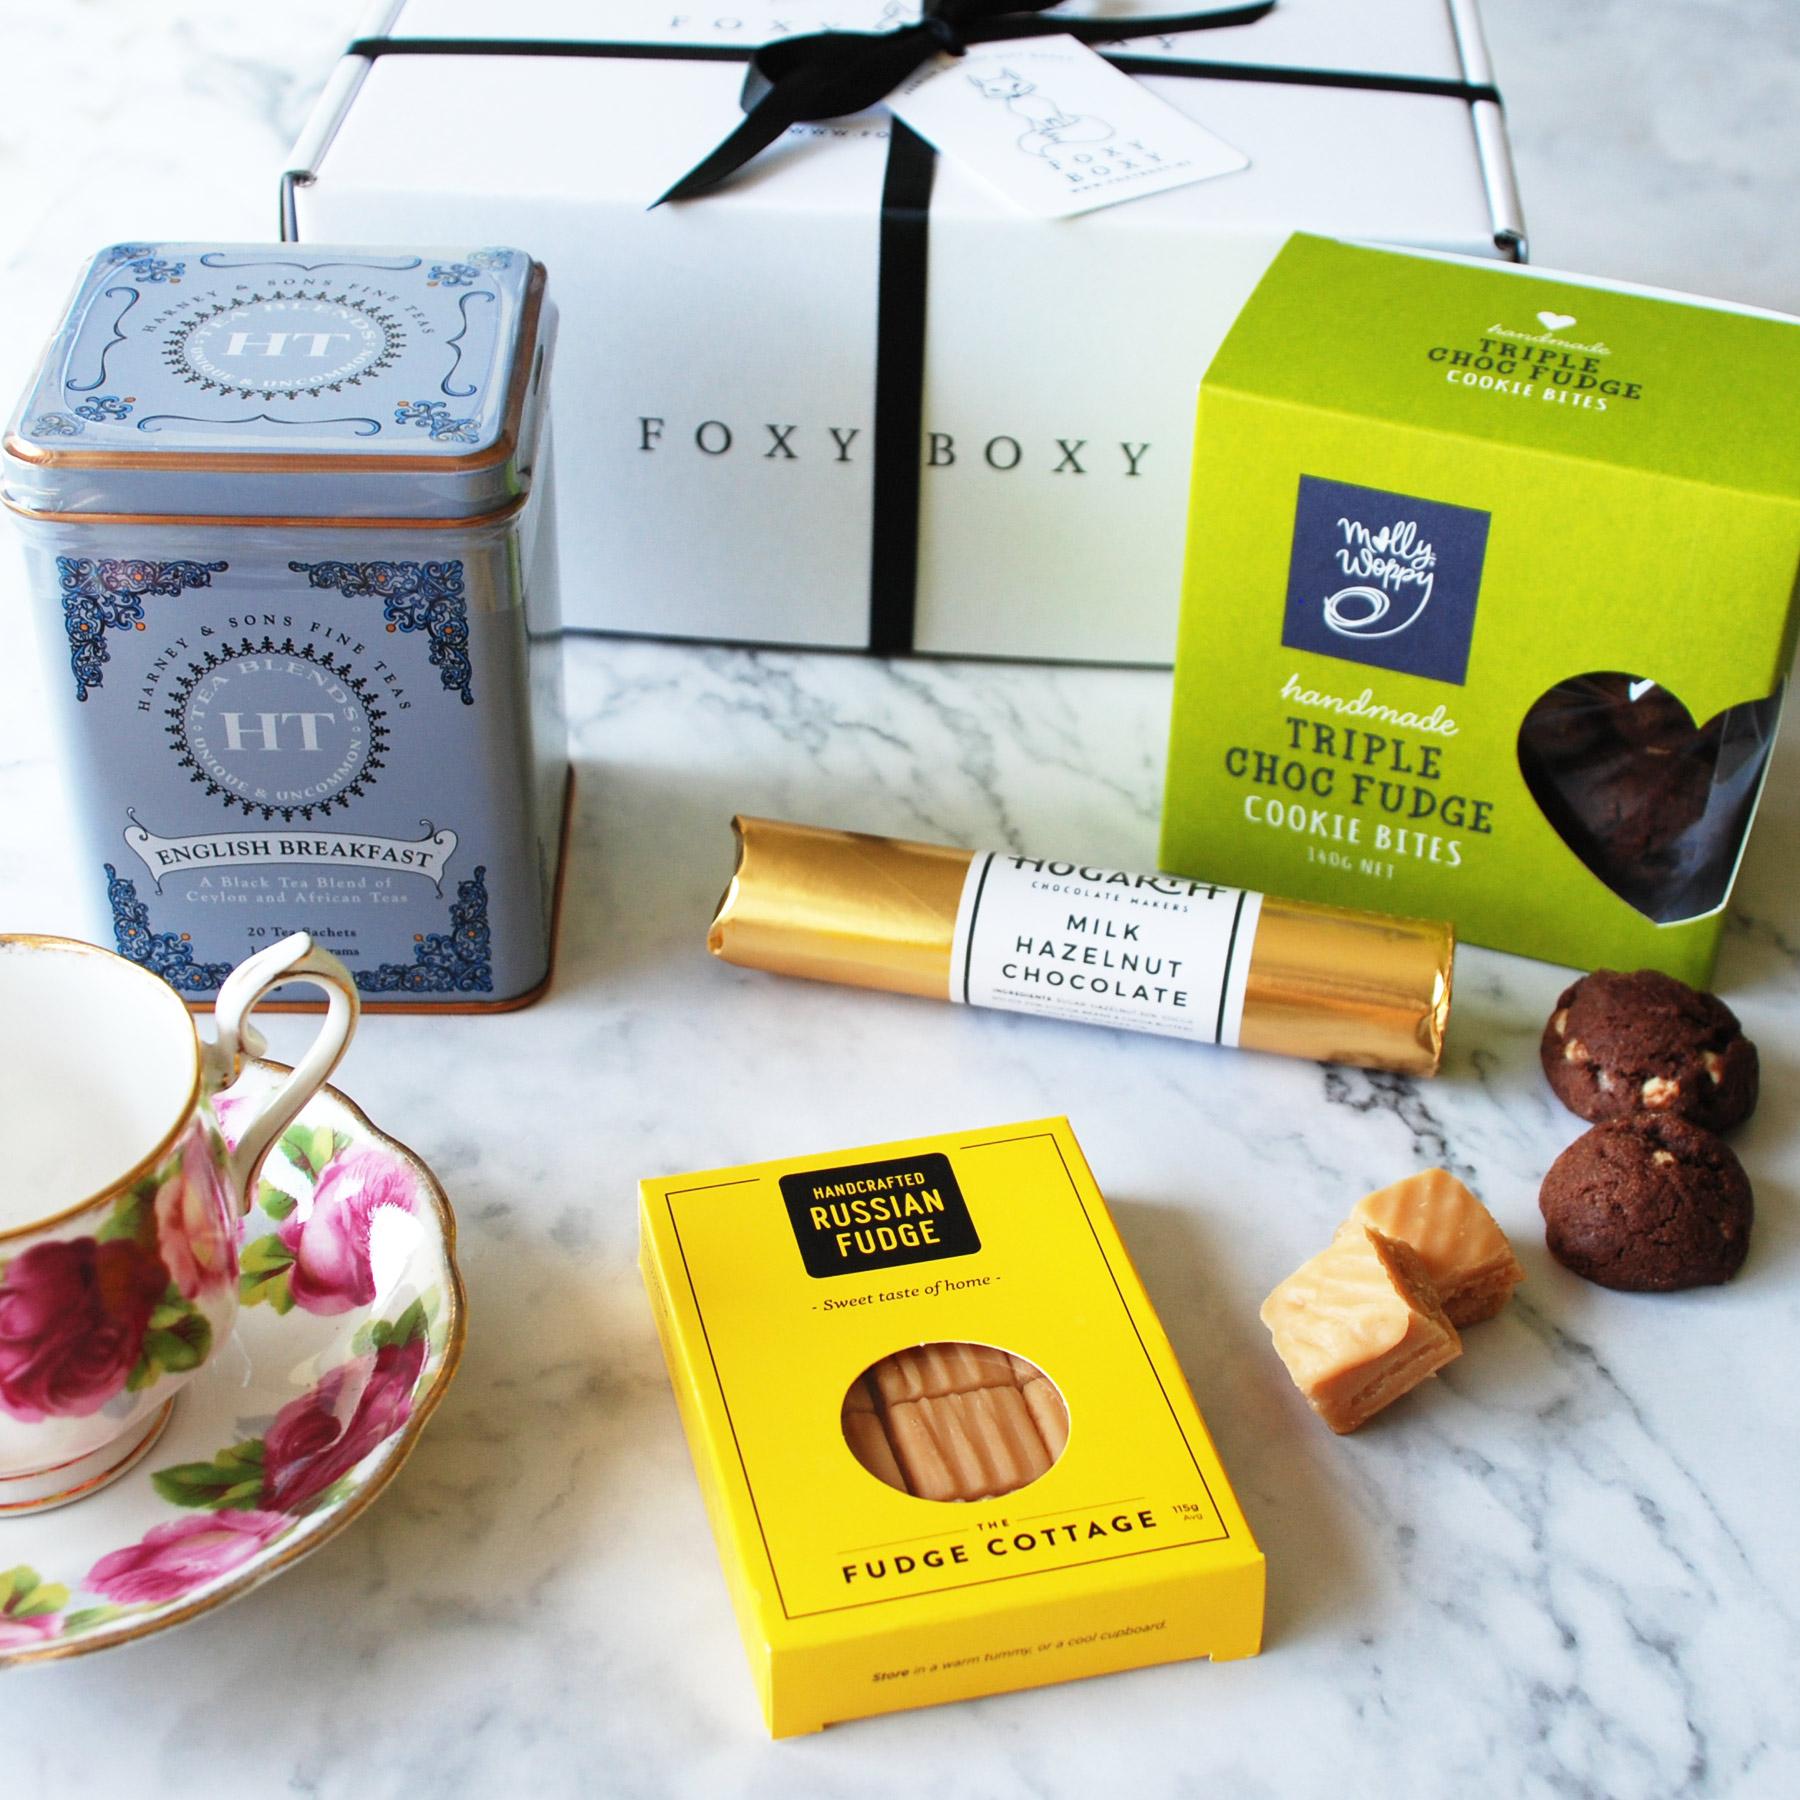 Tea, Cookies & Treats